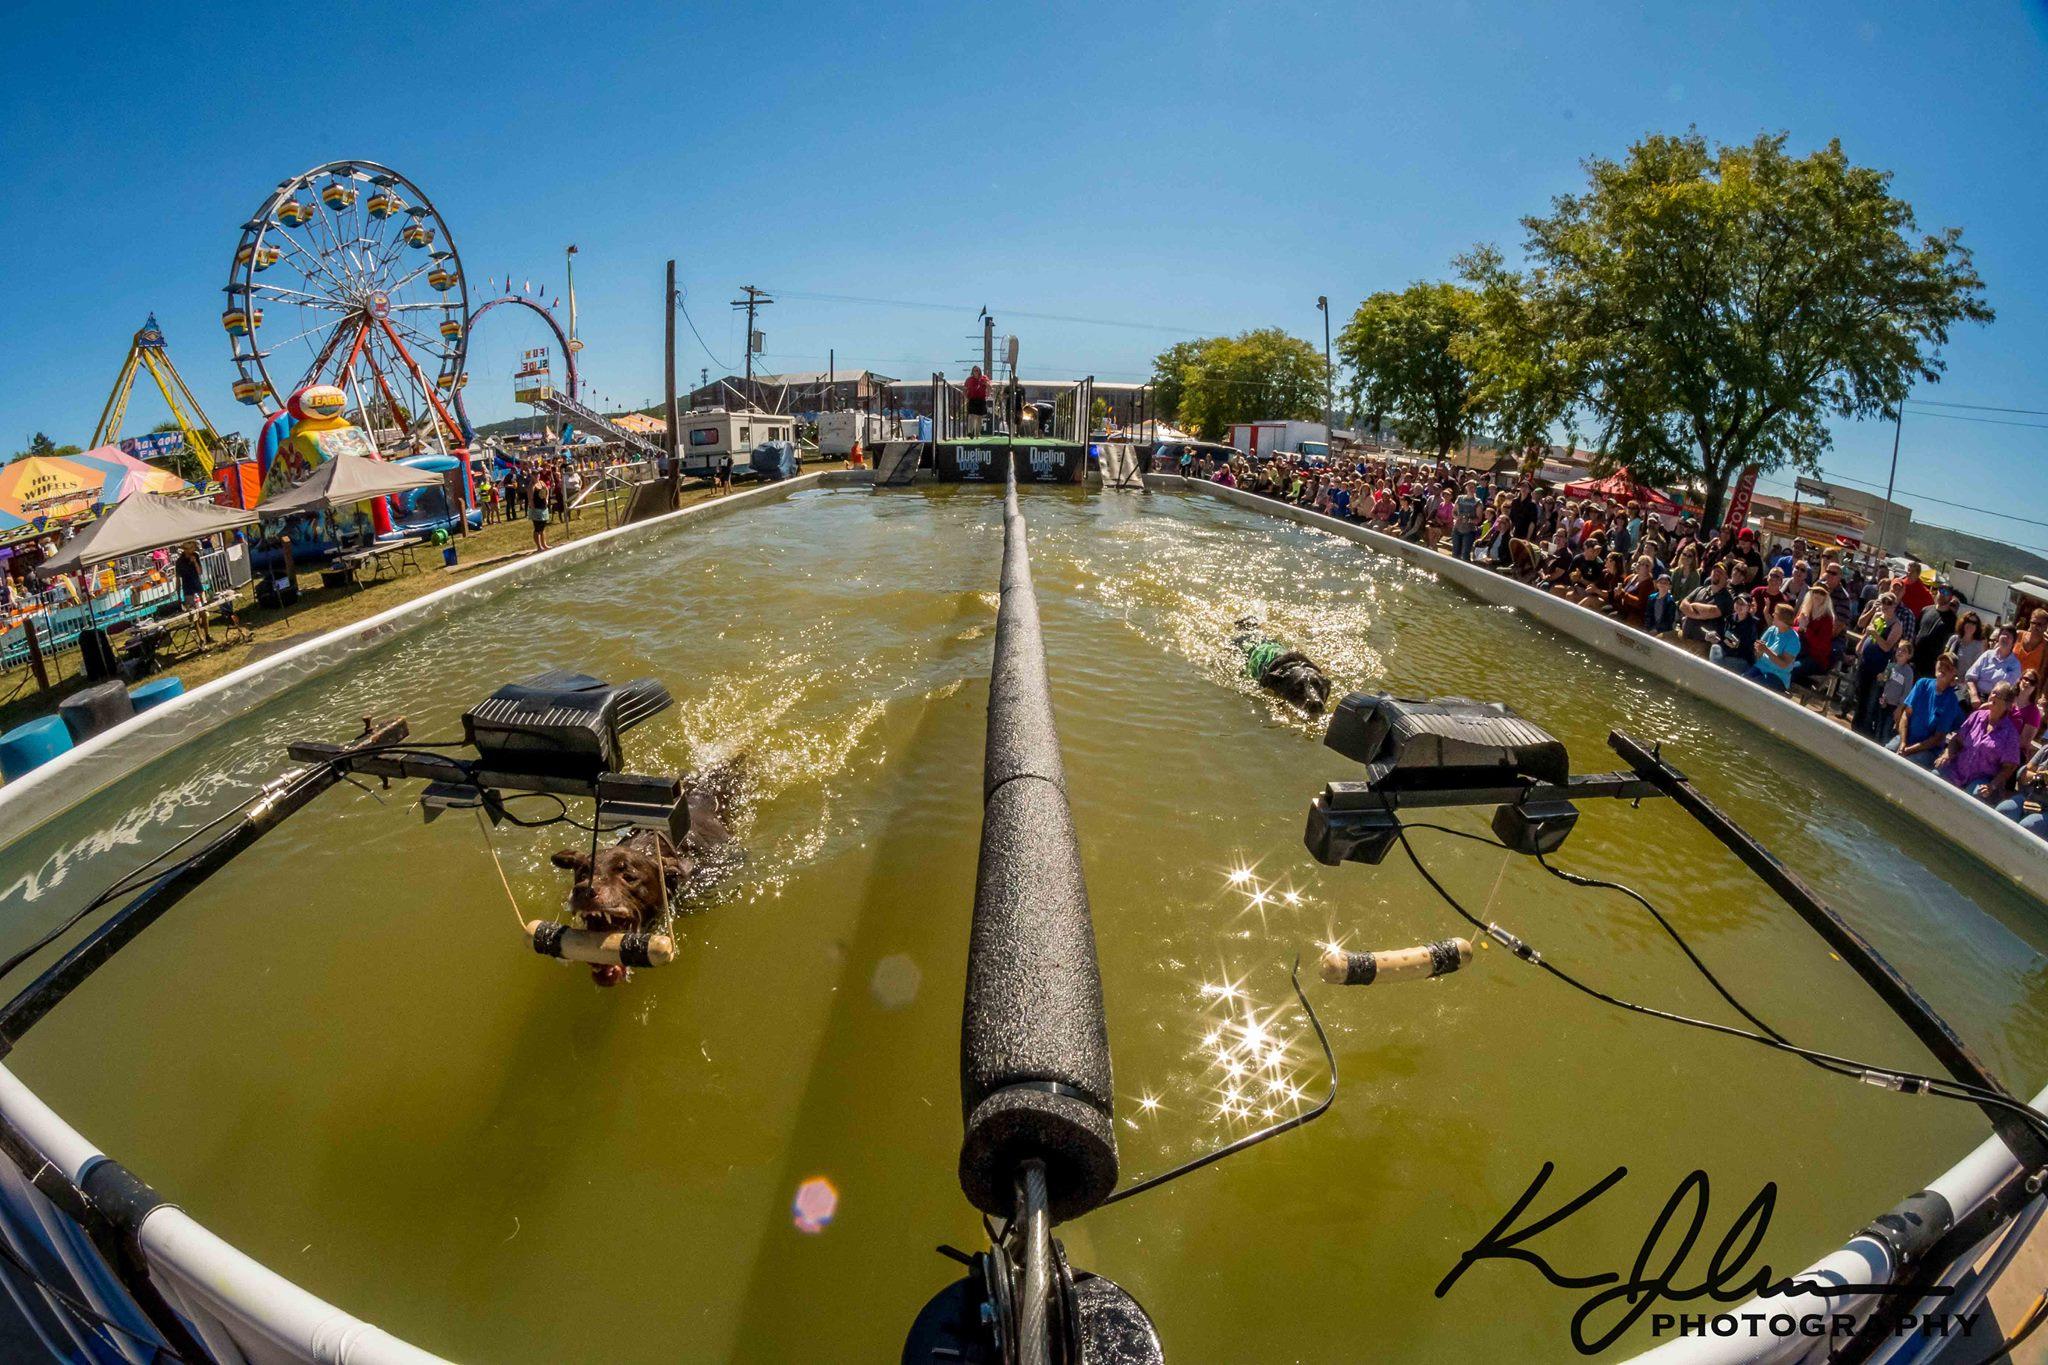 Radio DockDogs Episode 152 – Dueling Dogs in Canada & DockDogs in Ohio